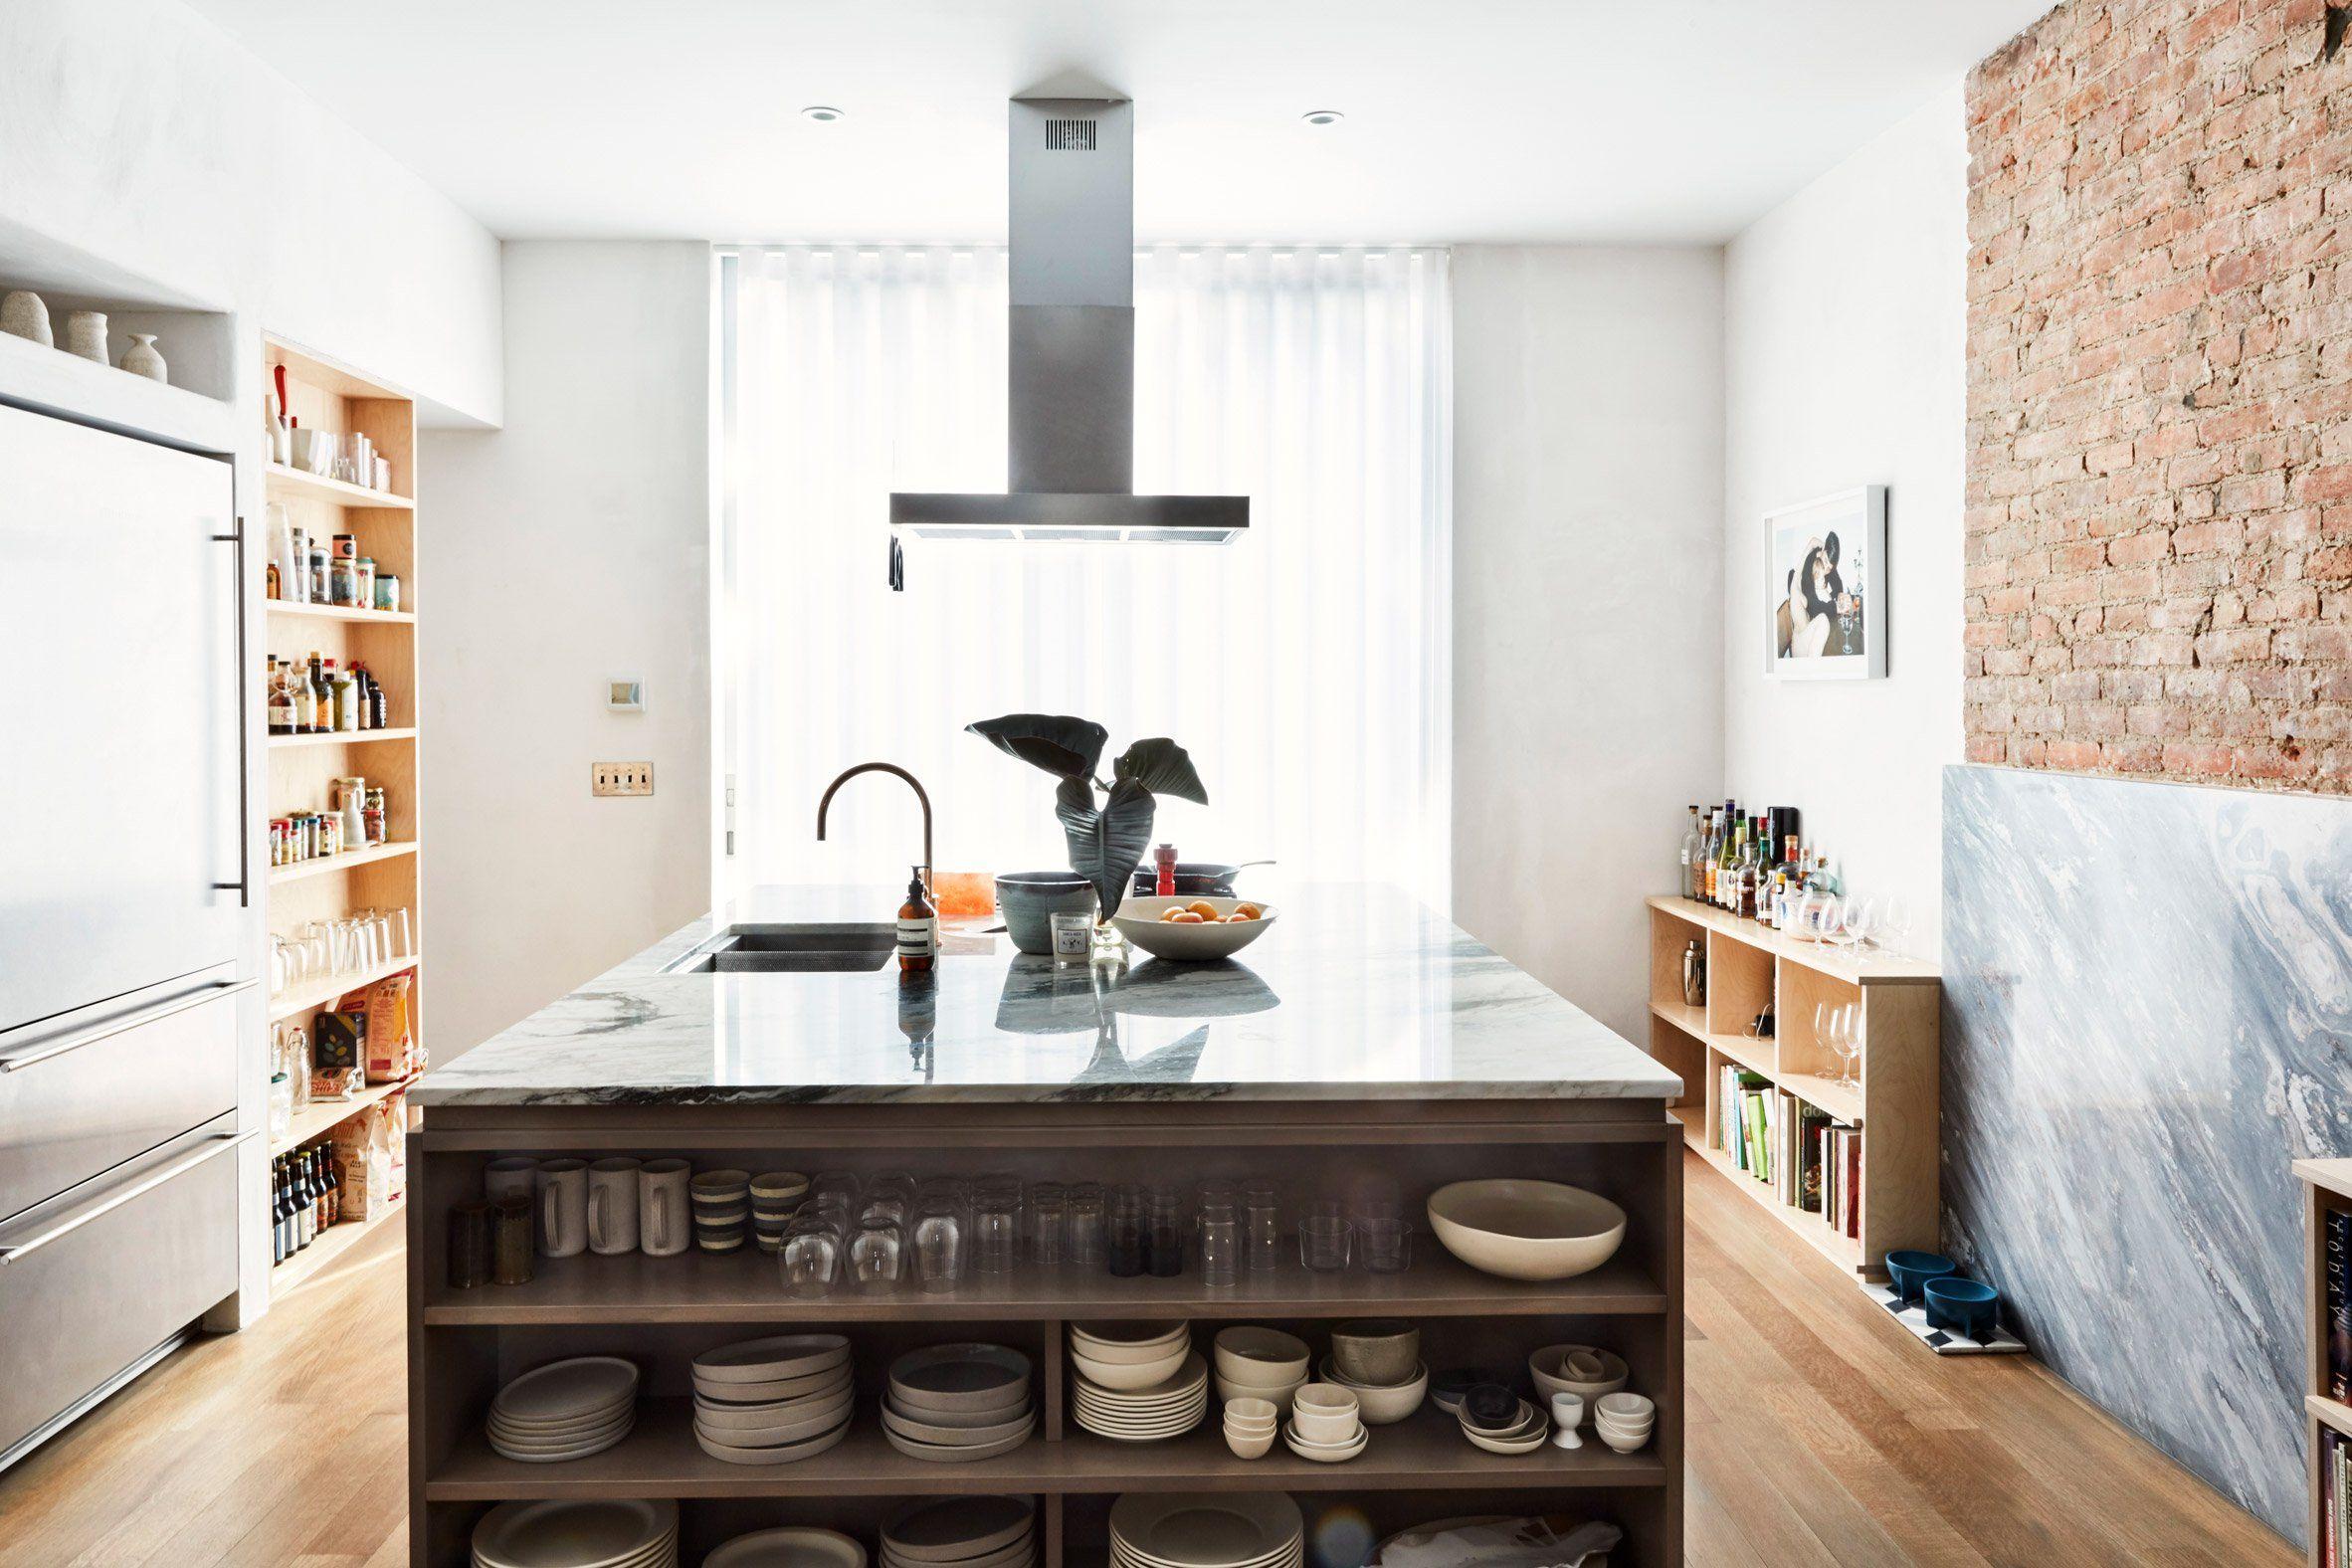 design store owner lauren snyder and architect keith burns renovated rh pinterest com